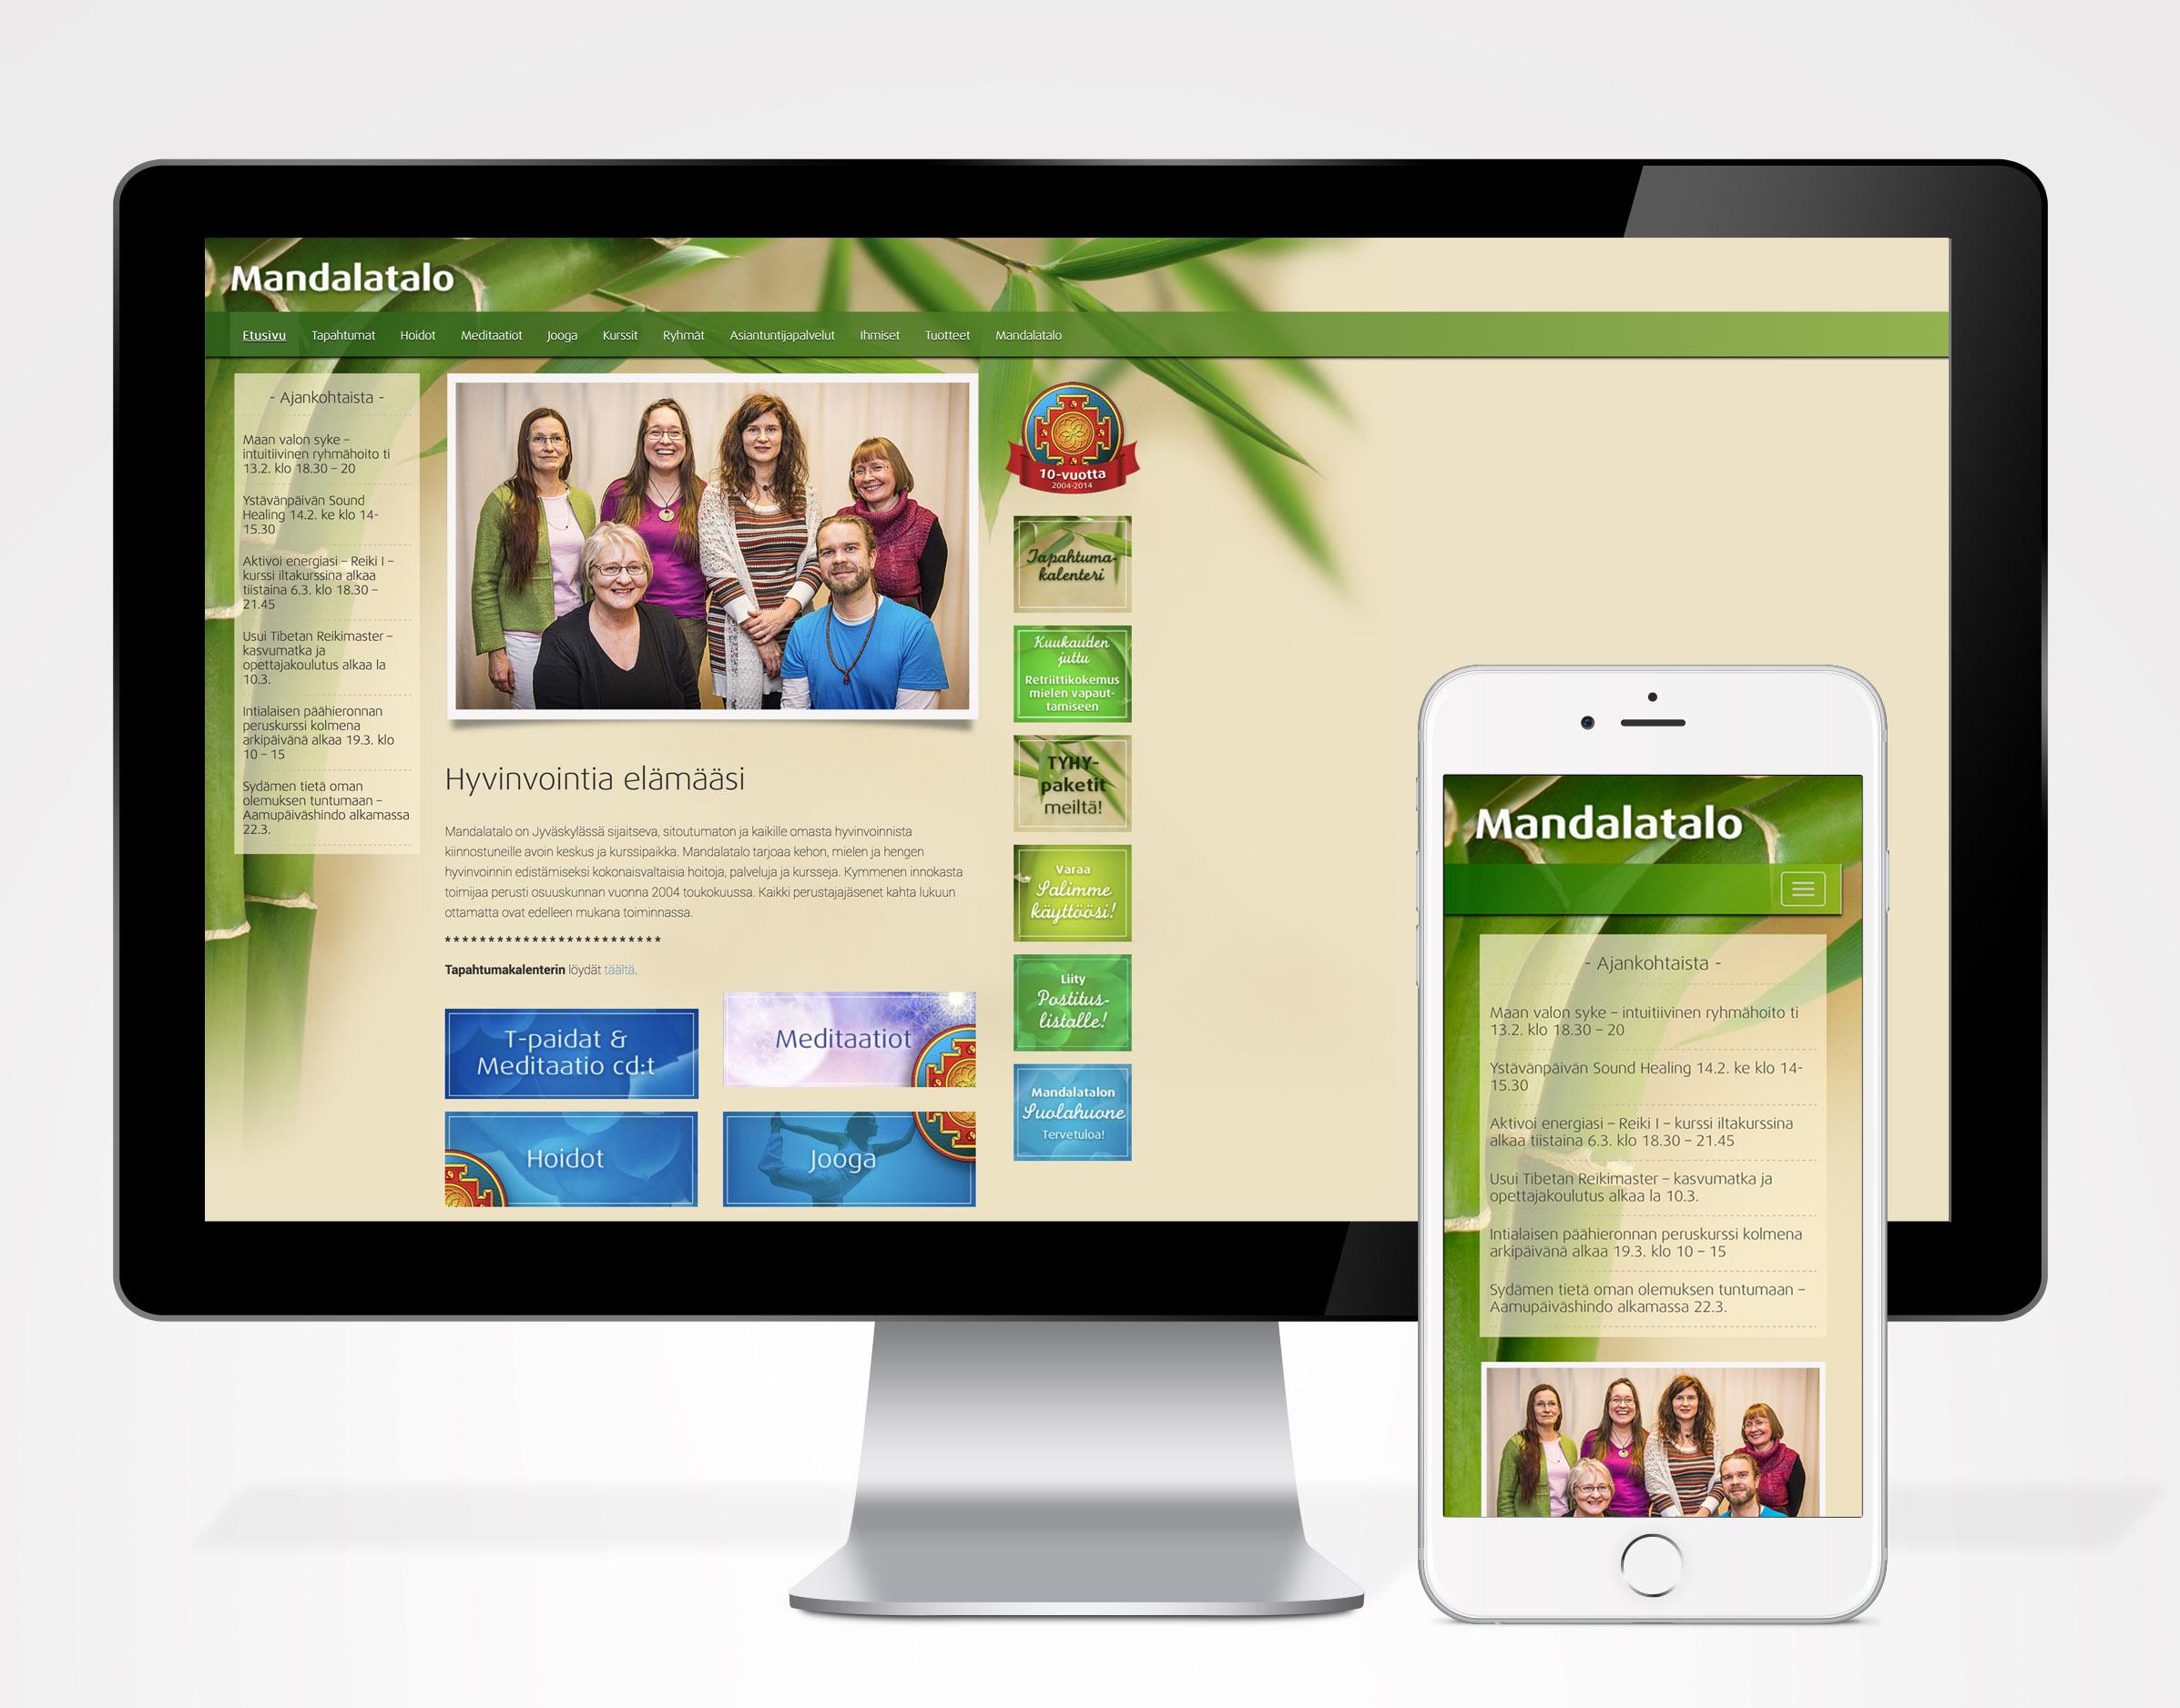 Mandalatalon ilme, logo, web-sivut